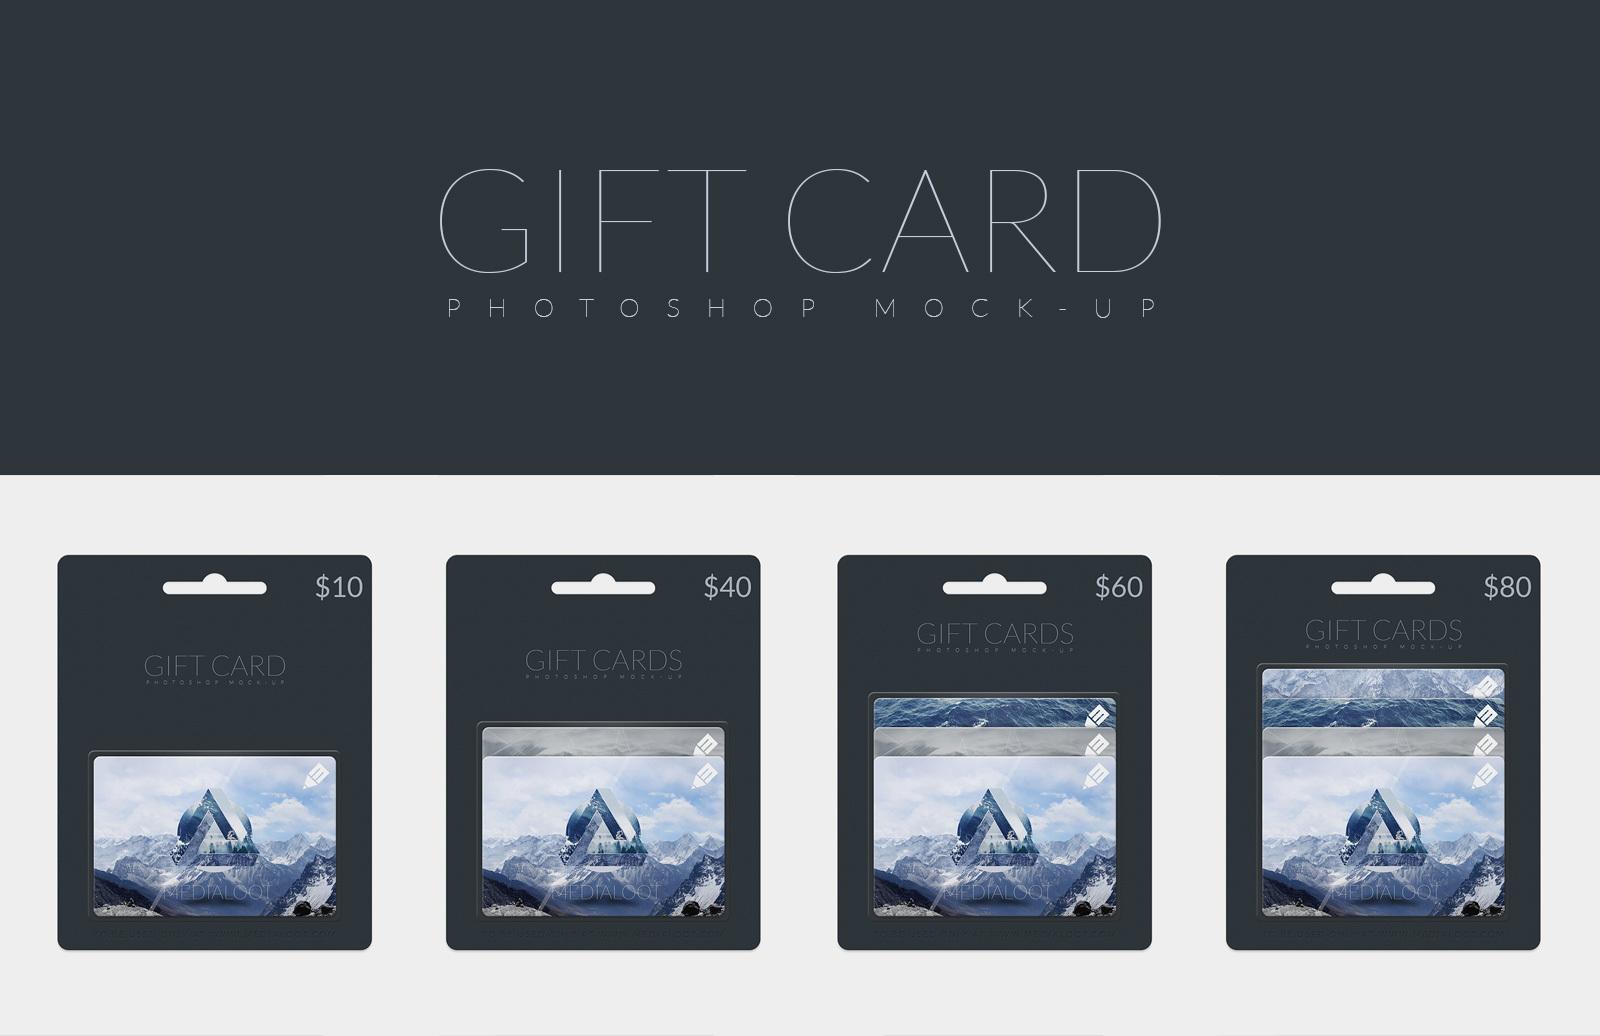 Gift Card Photoshop Mockup